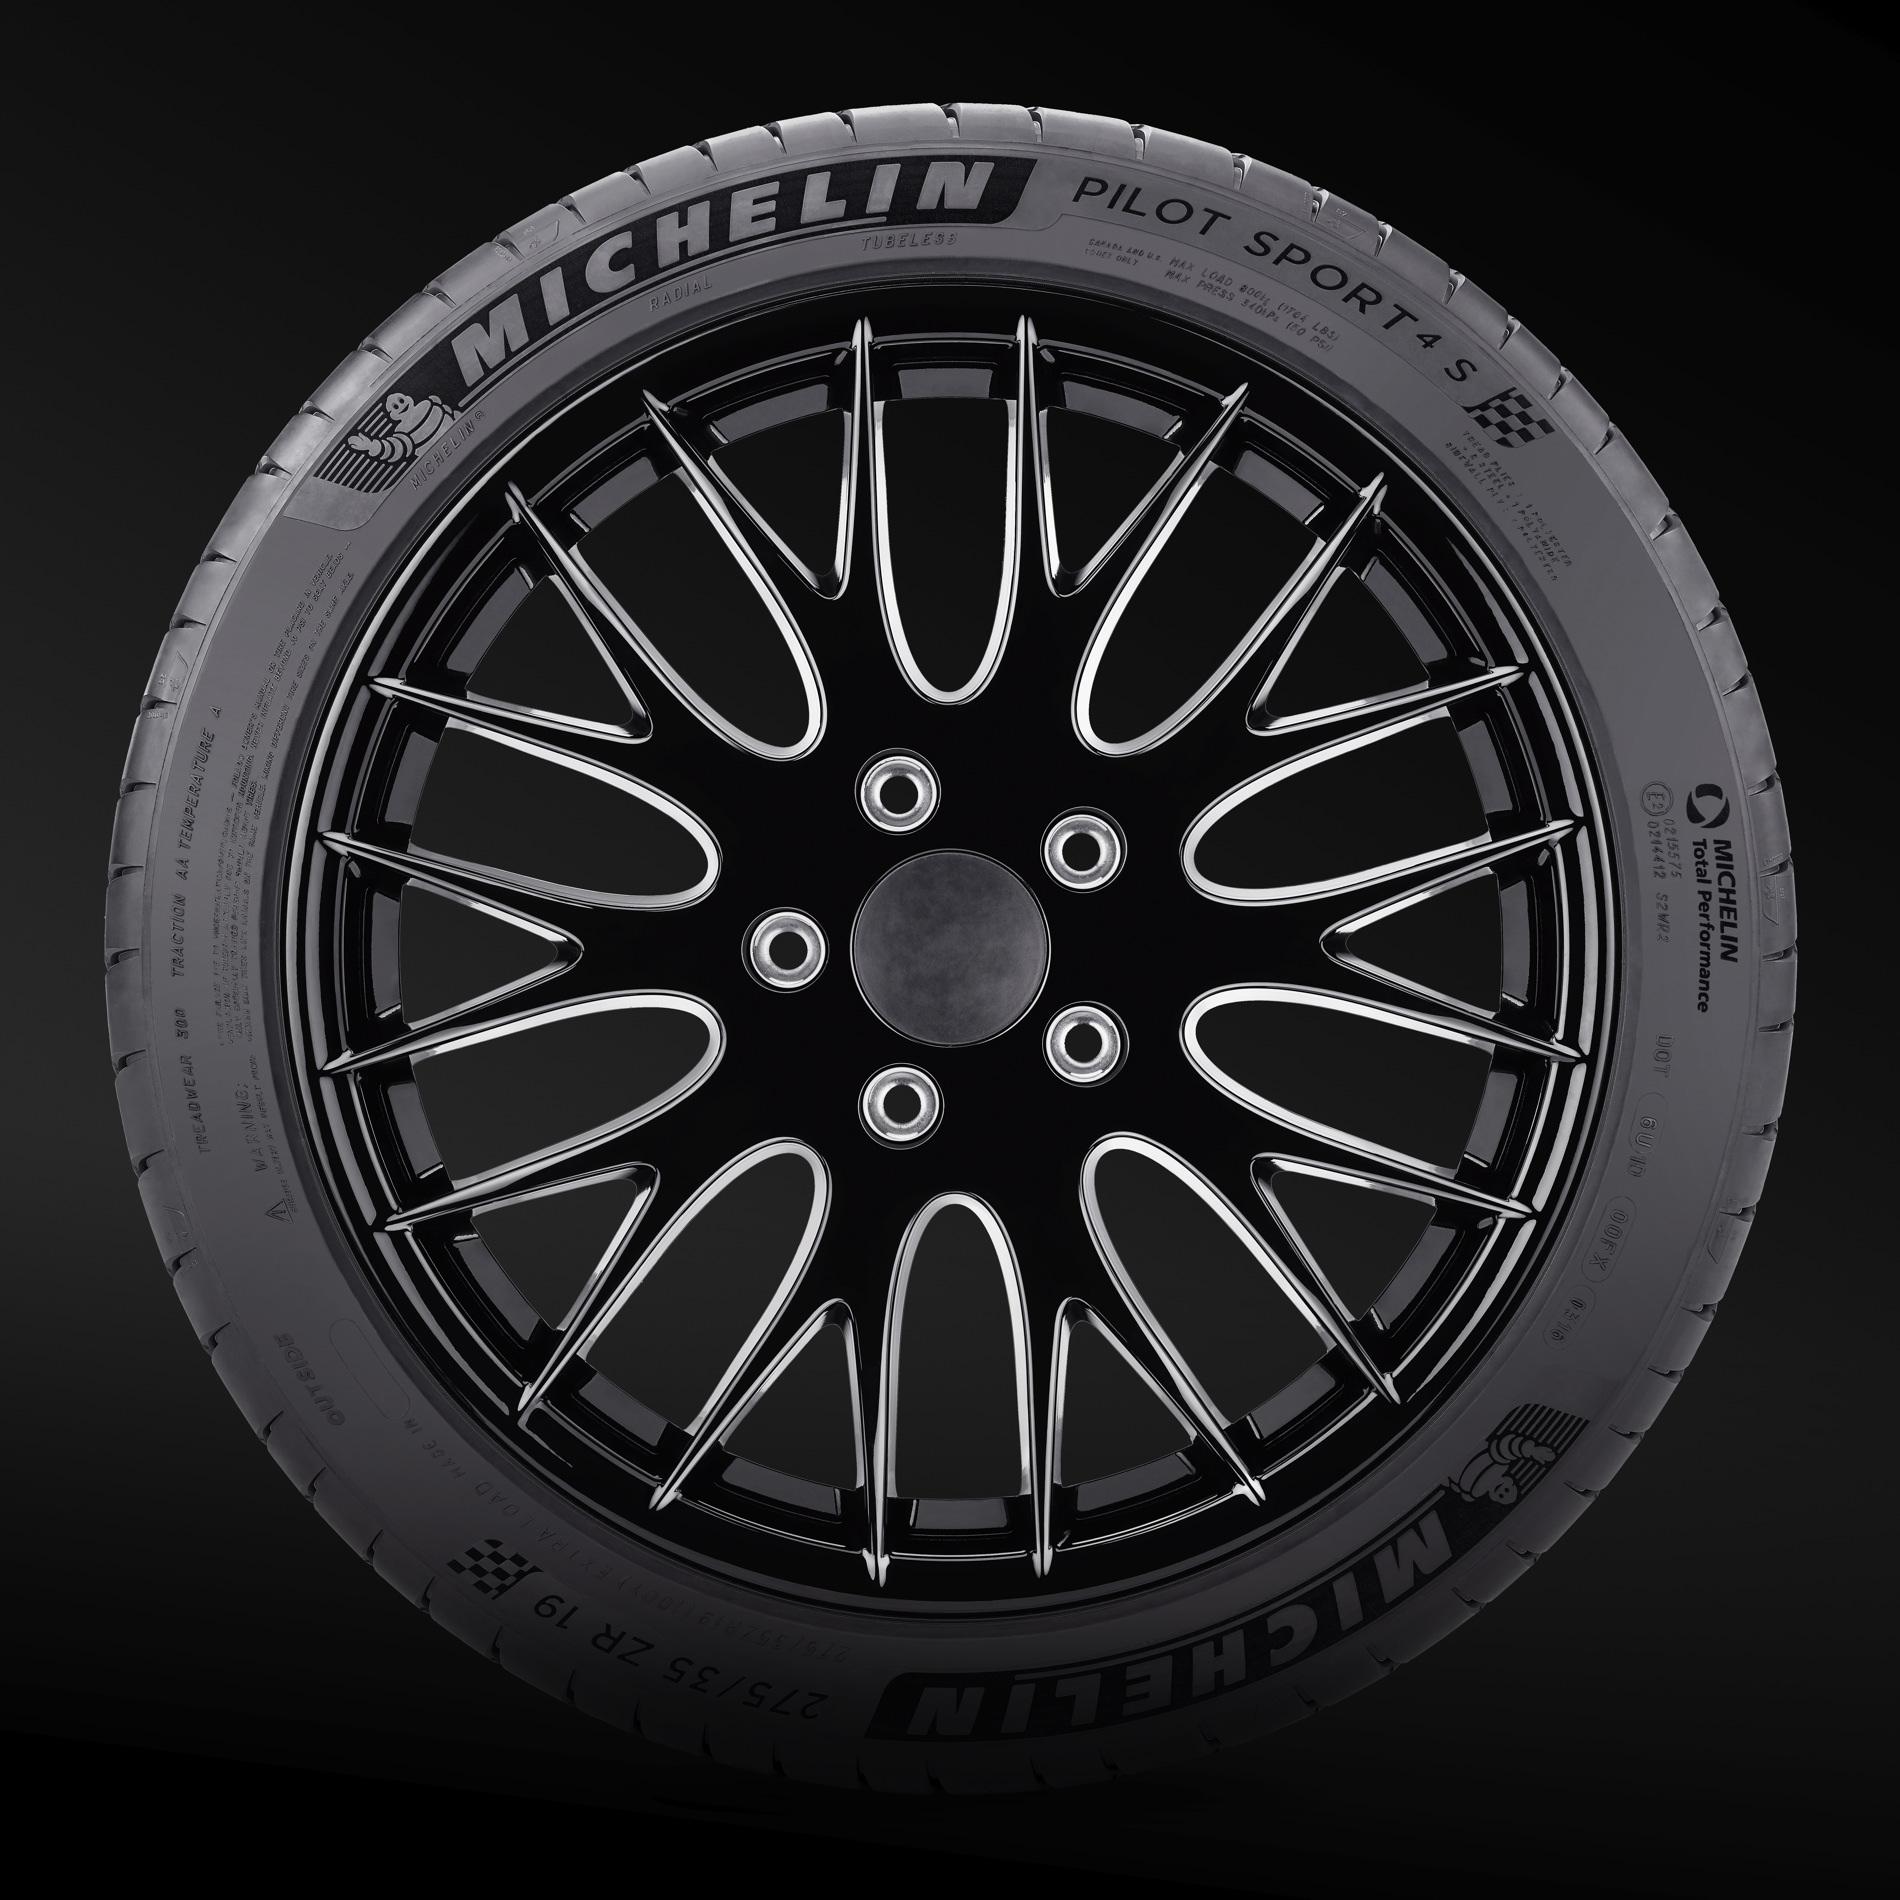 Michelin Pilot Super Sport Review >> Michelin Announces Pilot Super Sport Successor At The ...